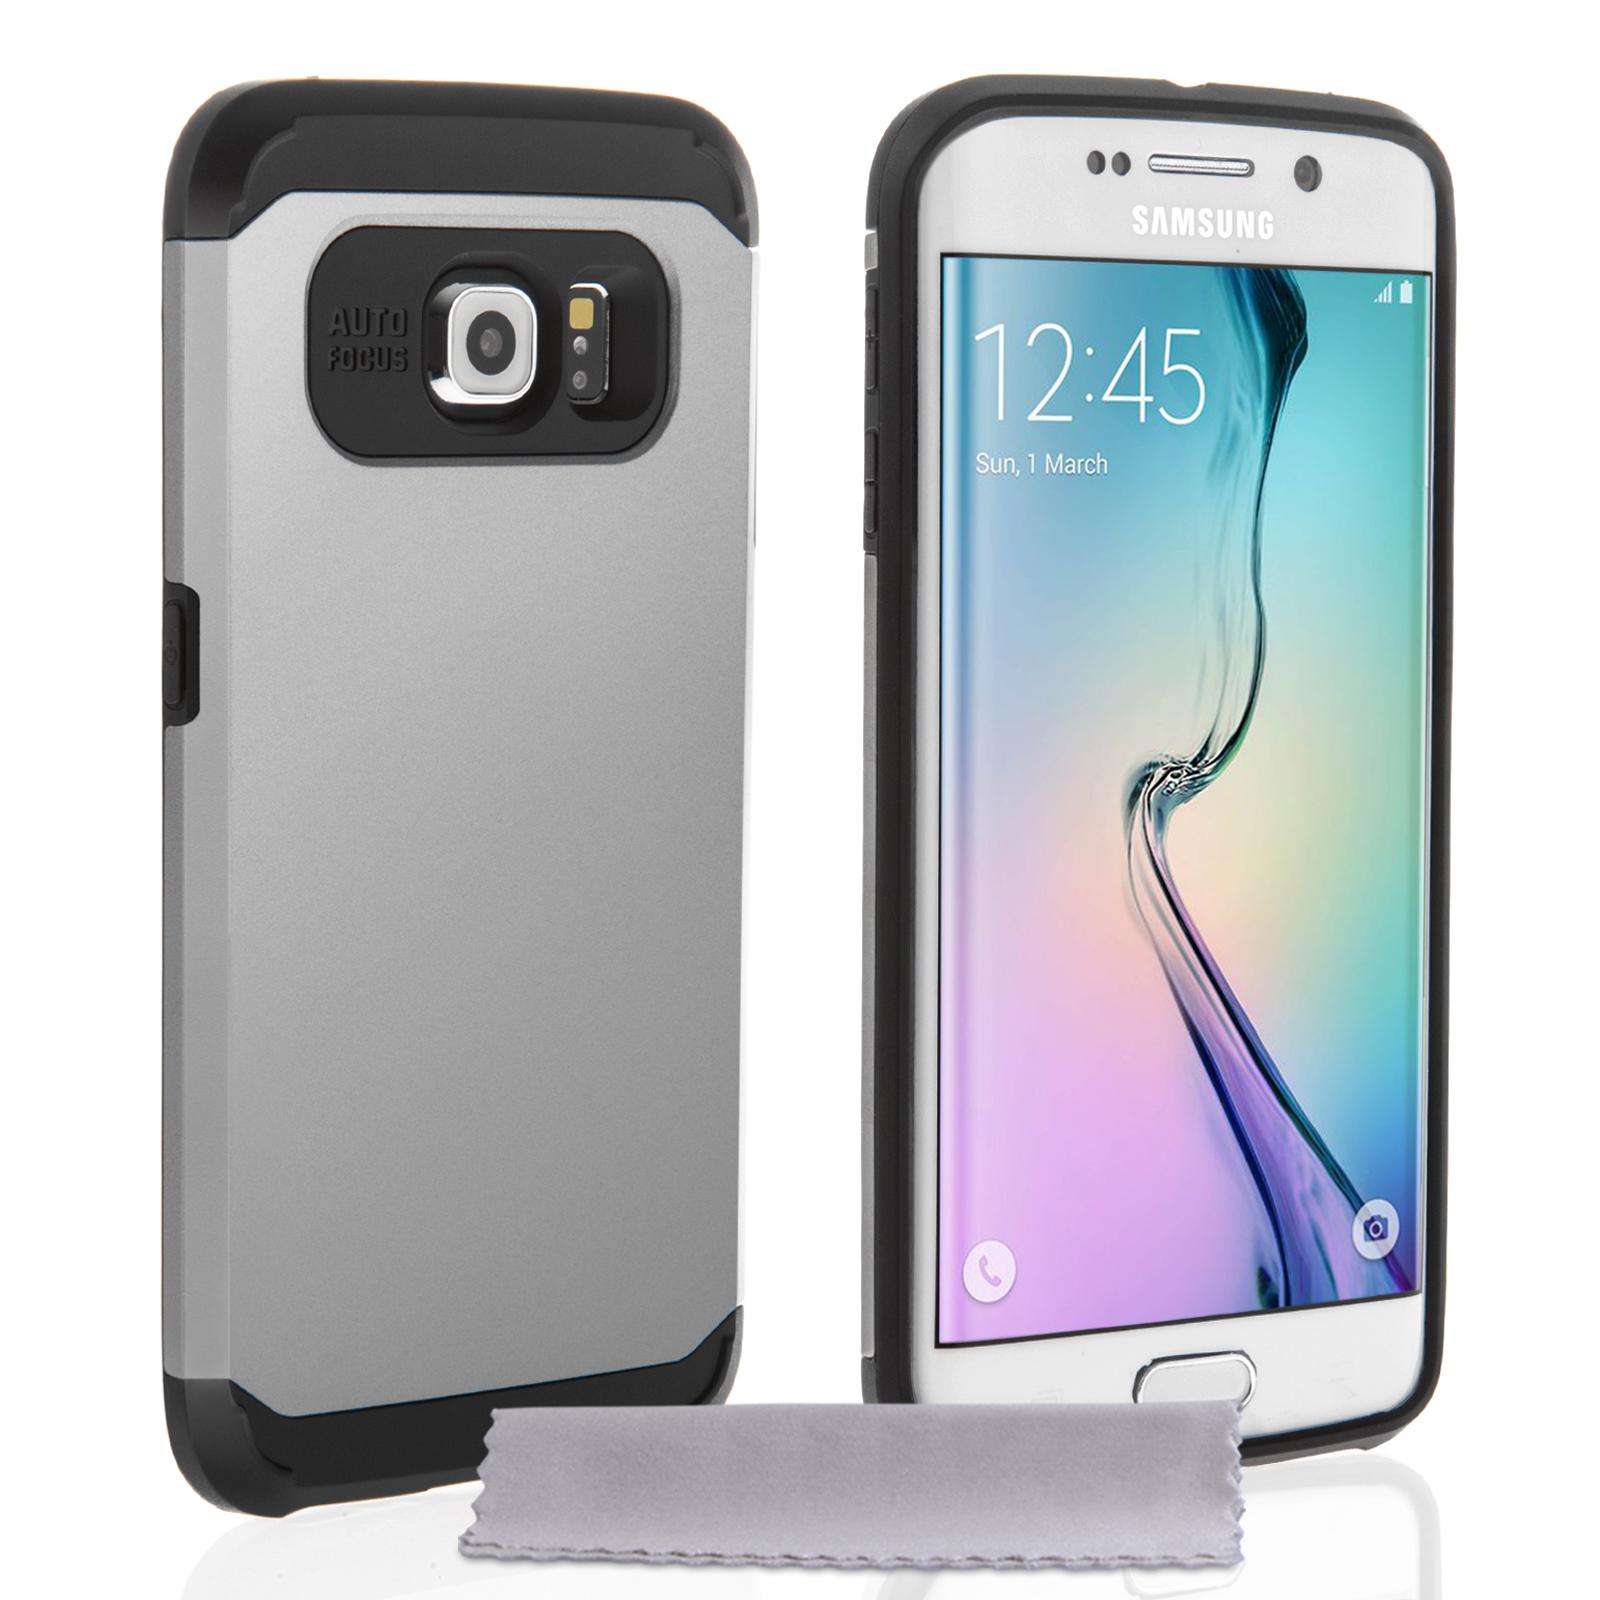 Caseflex Tough Armor Μεταλλική Ανθεκτική Θήκη Samsung Galaxy S6 Edge (Z523)